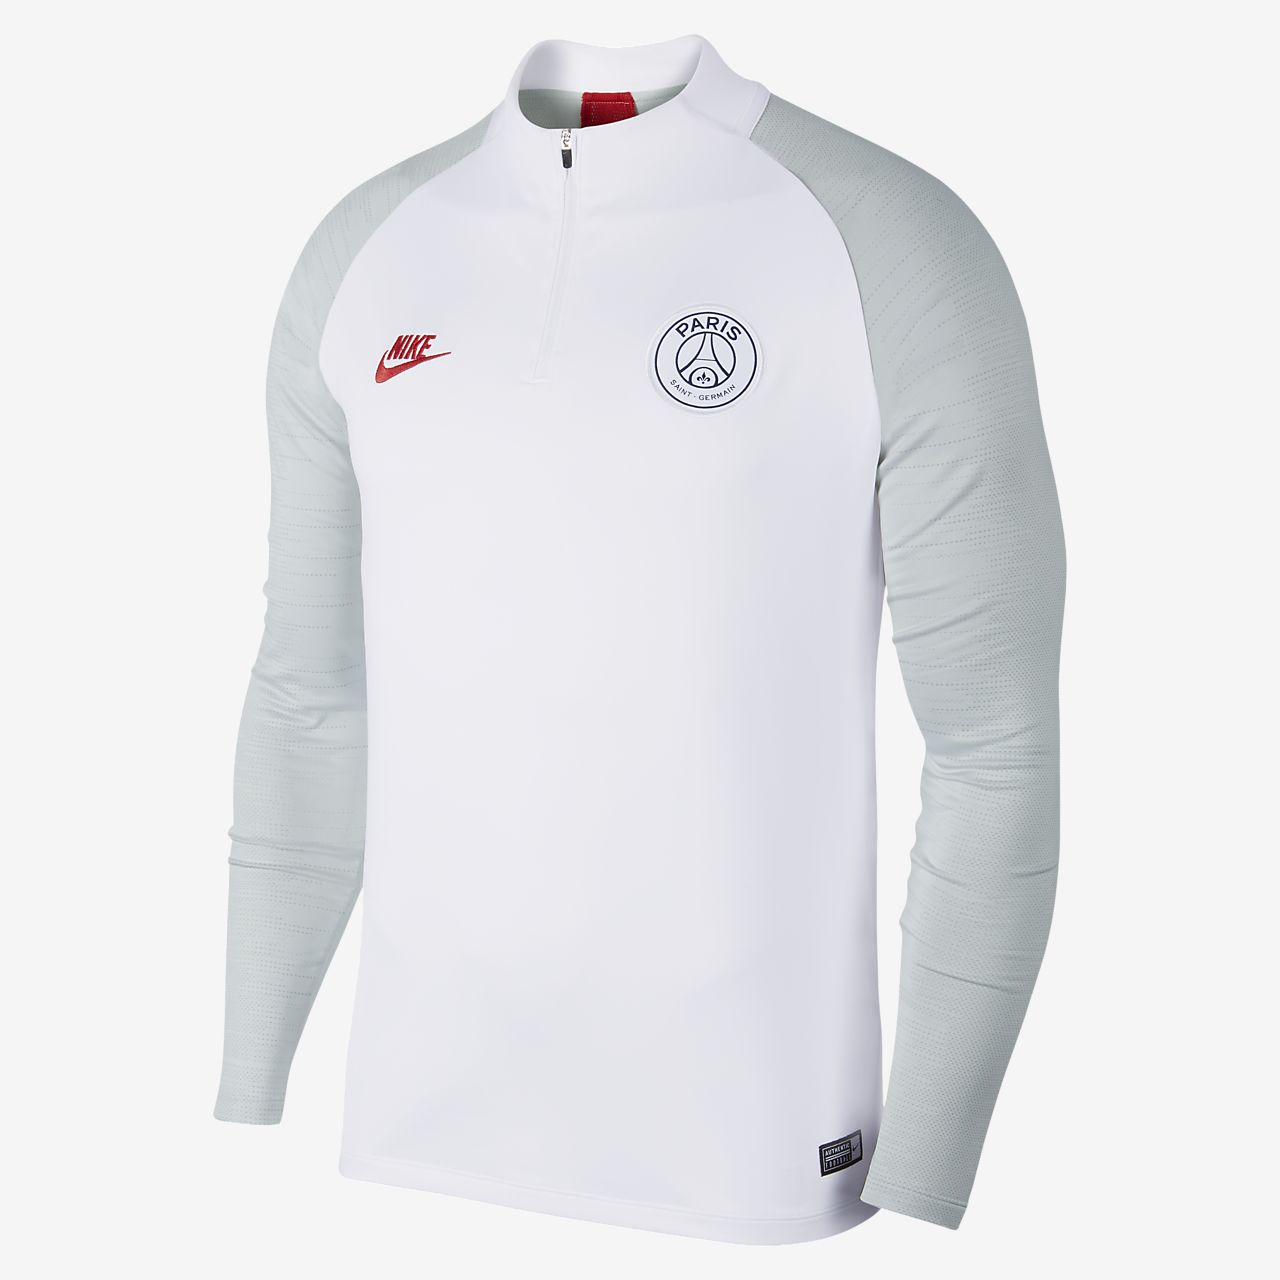 Nike Dri-FIT Paris Saint-Germain Strike fotballtreningsoverdel til herre